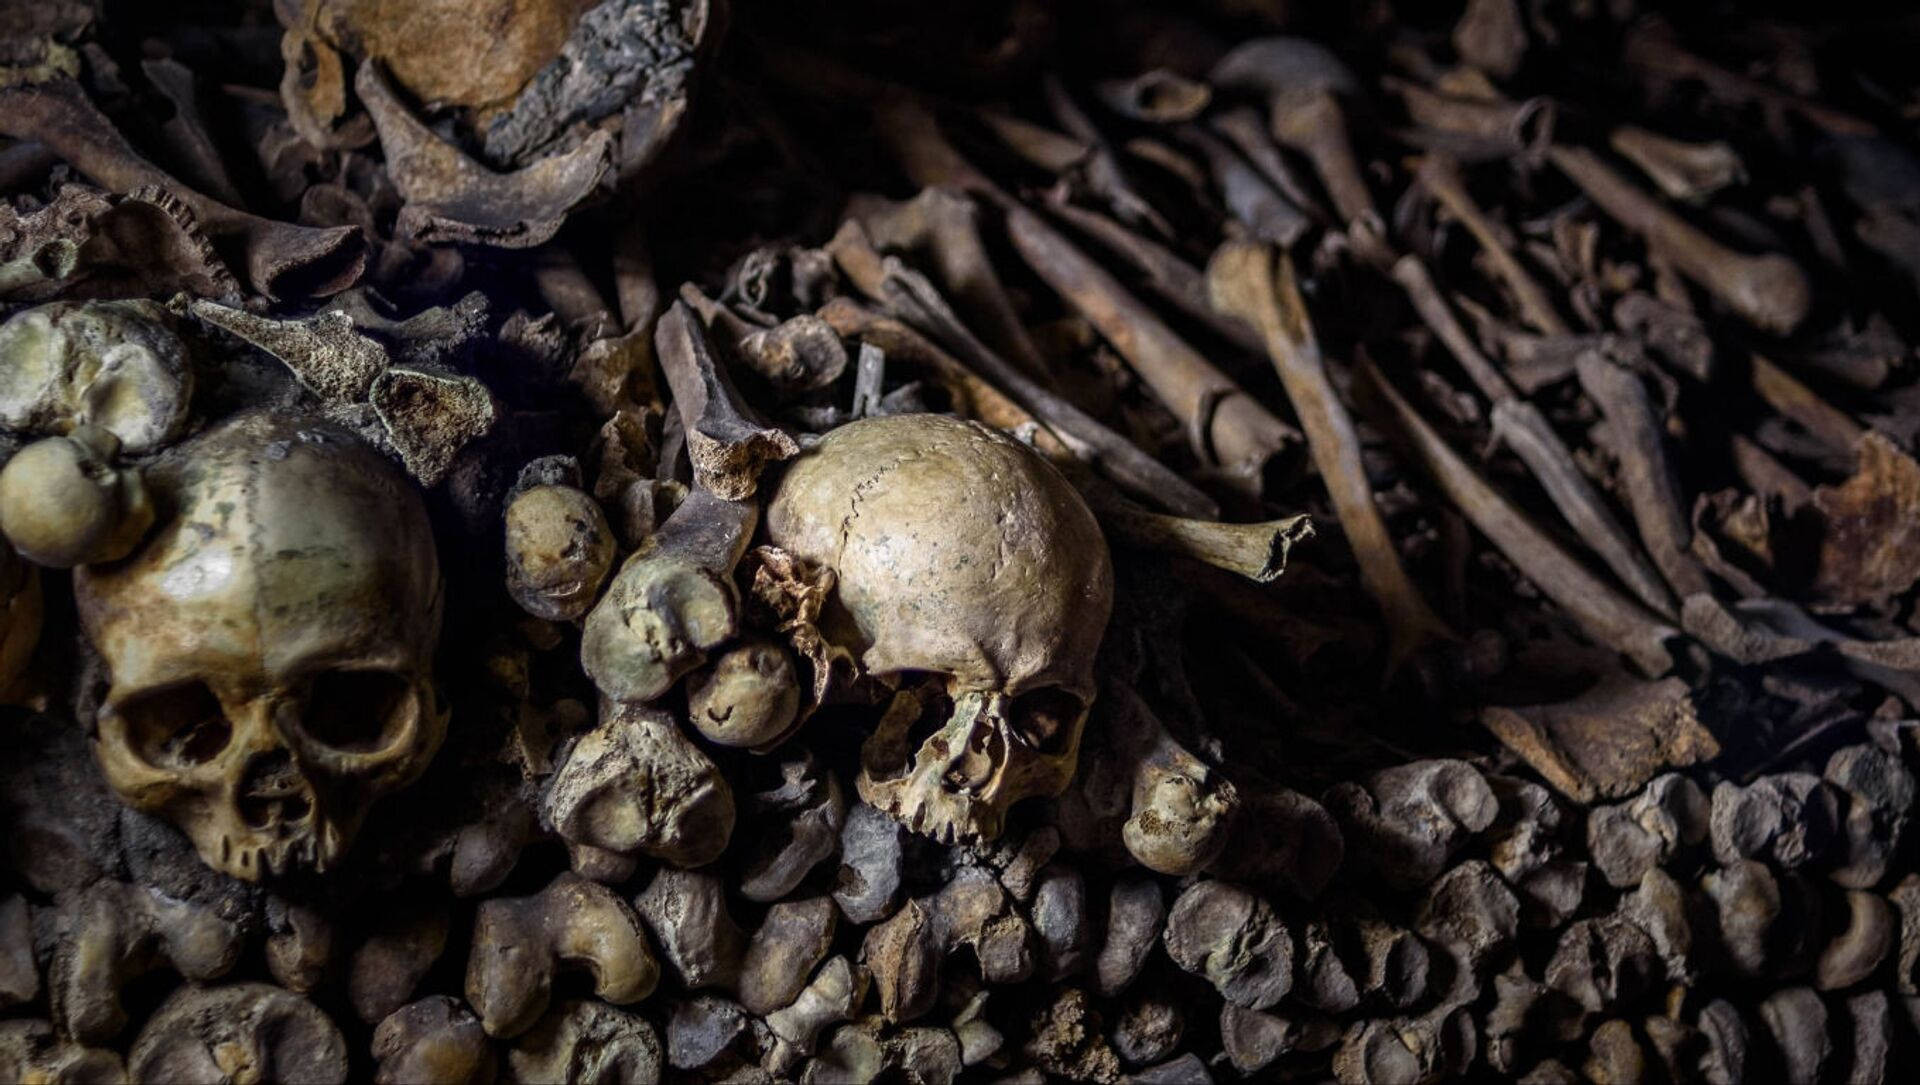 Human bones - Sputnik International, 1920, 30.08.2021